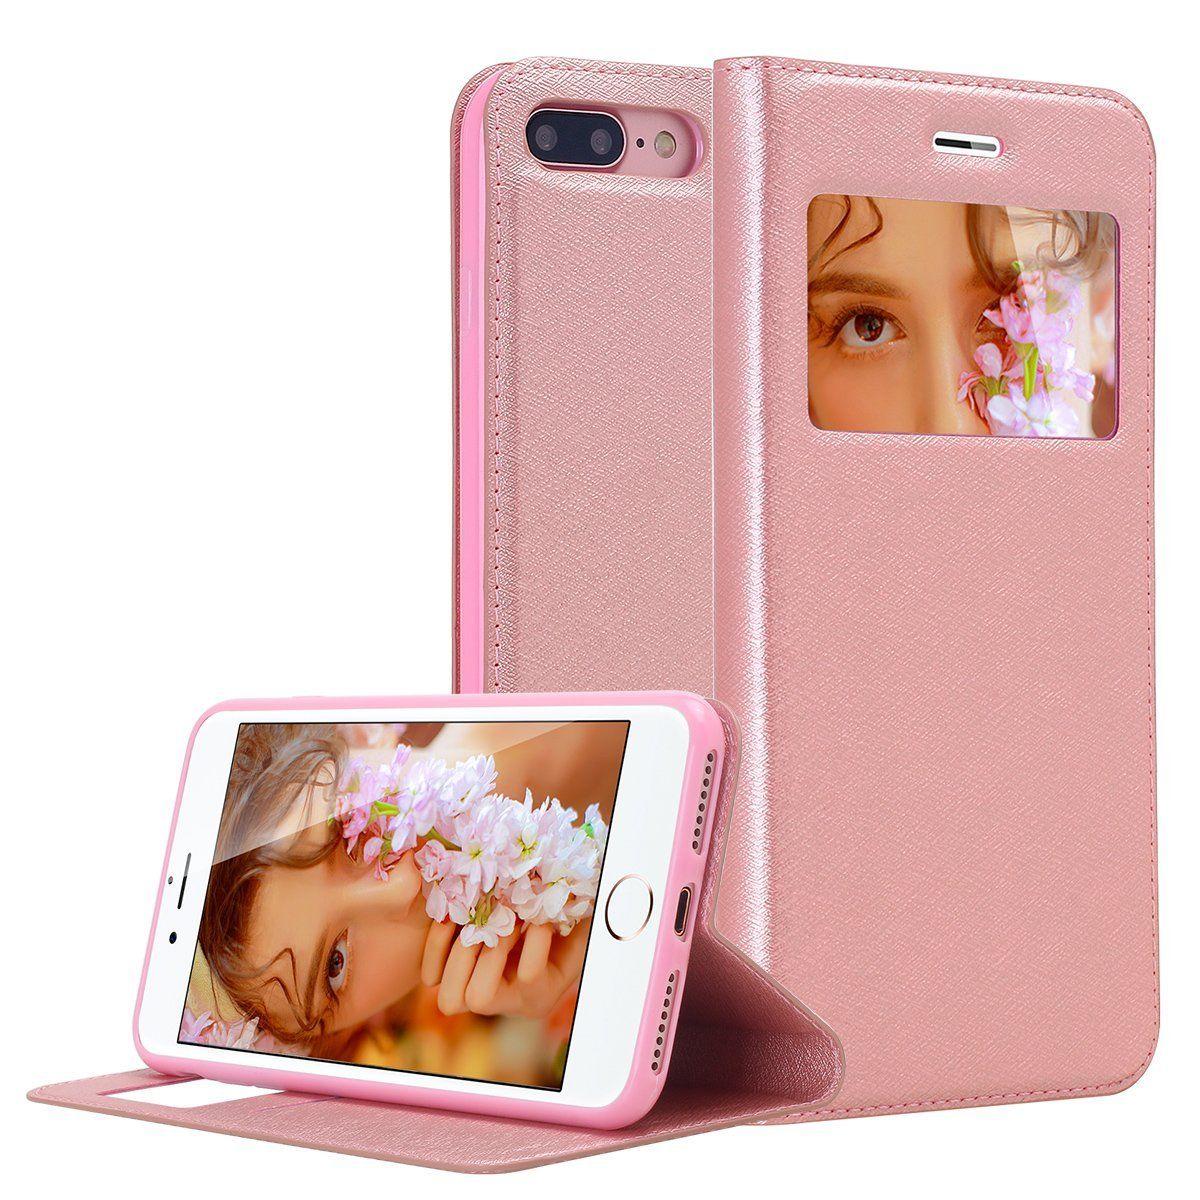 Iphone 8 Plus Case Iphone 7 Plus Case Hekodonk Window View Brushed Pu Leather Slim Folio Flip Cover Tpu Soft Inner S Iphone Iphone 7 Plus Cases Iphone 7 Plus